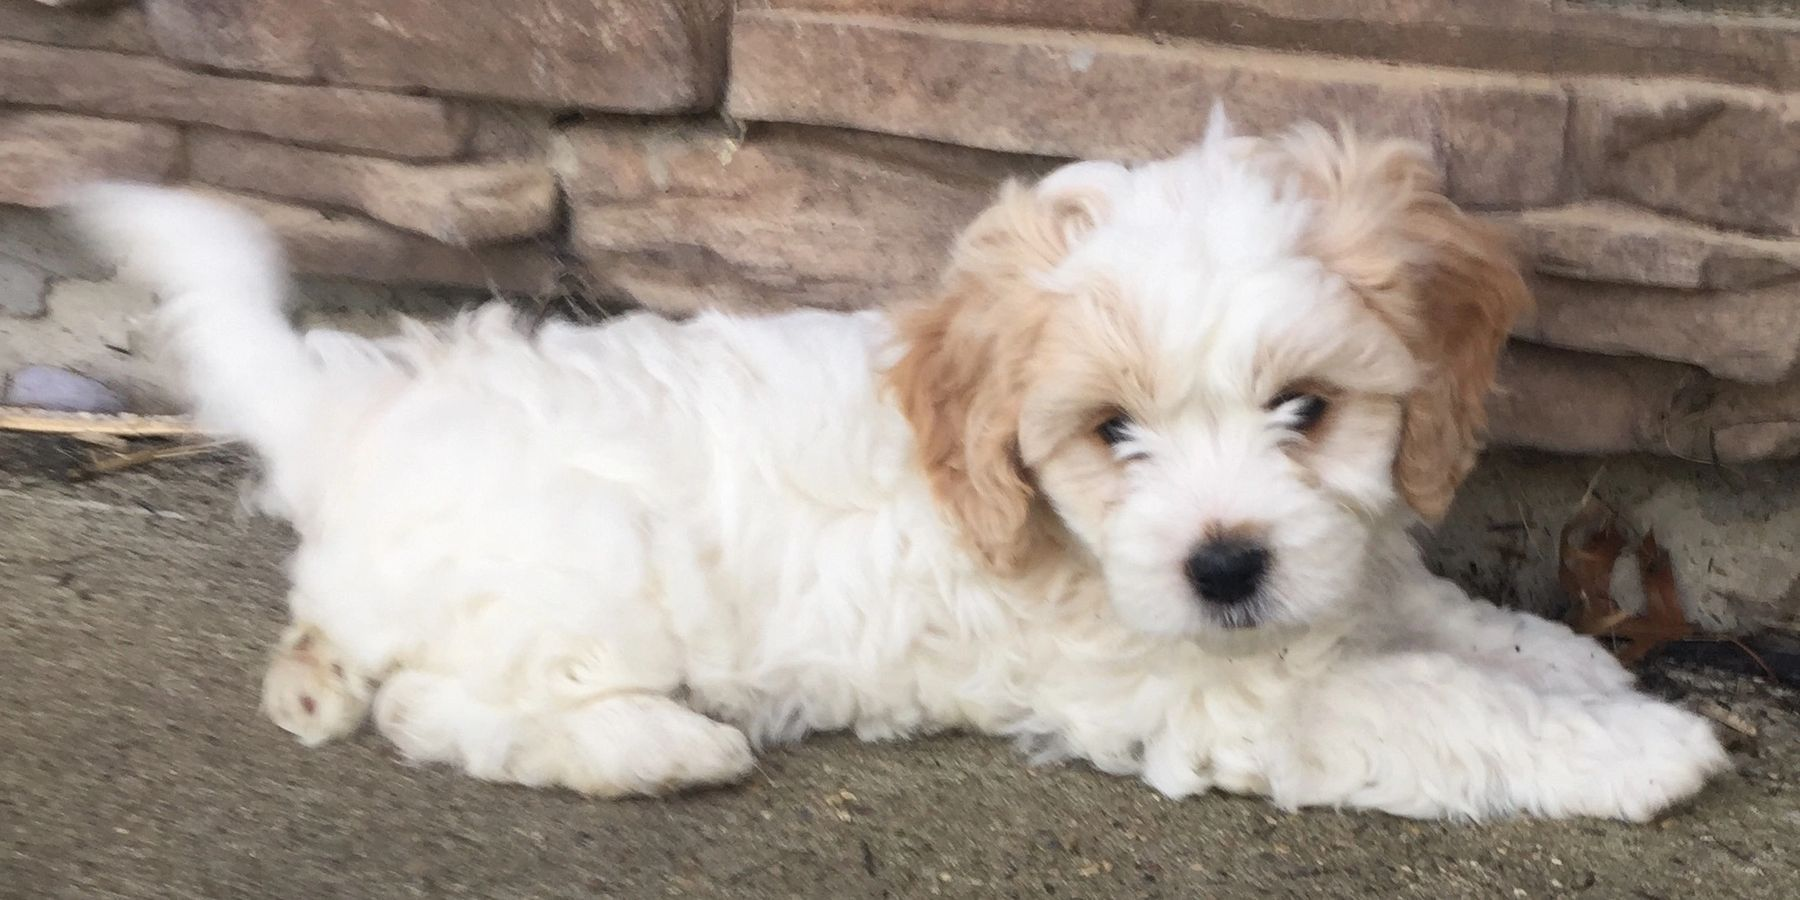 Herringtonlakecavachon Com In 2020 Cute Small Dogs Cavachon Puppies Kittens And Puppies